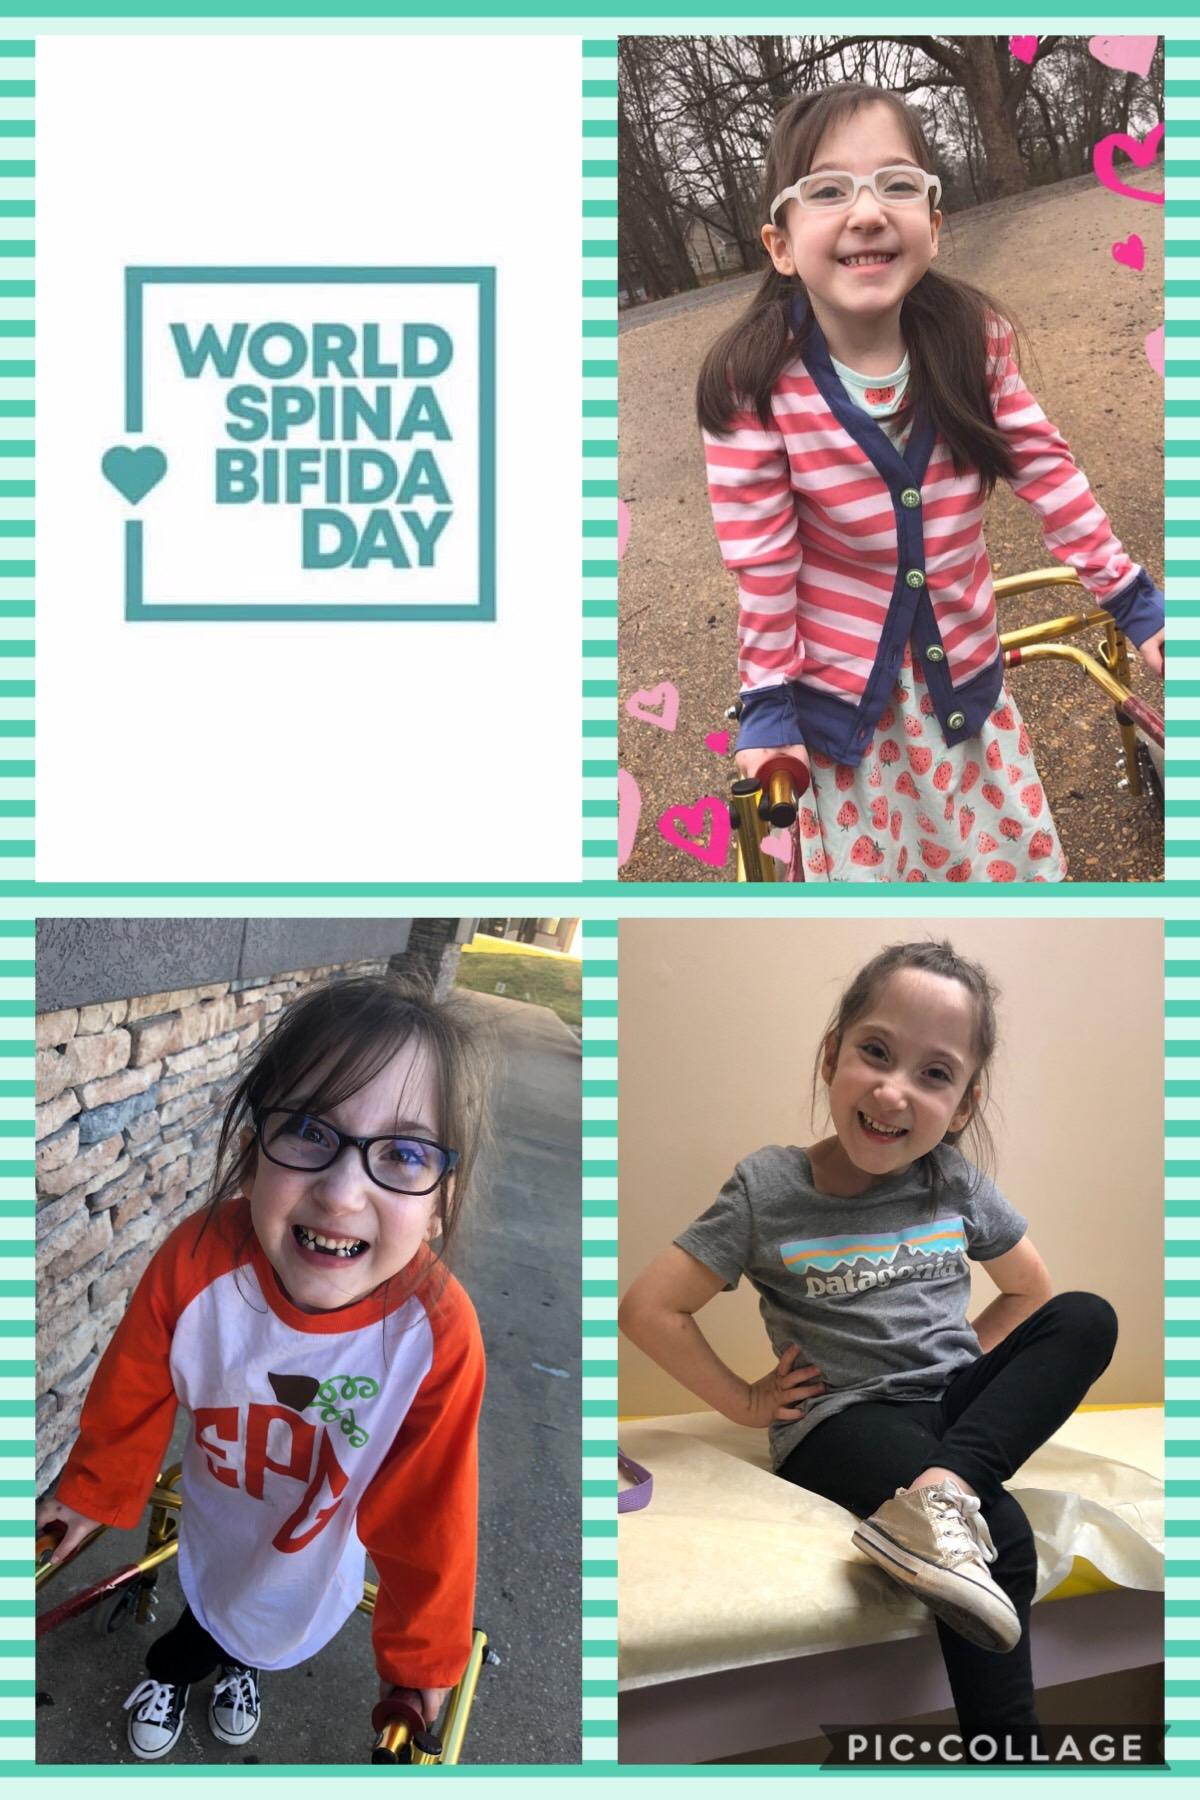 Celebrating World Spina Bifida Day with Elsee Peoples - Encore Rehabilitation-Winfield. #EncoreRehab #IamEncore